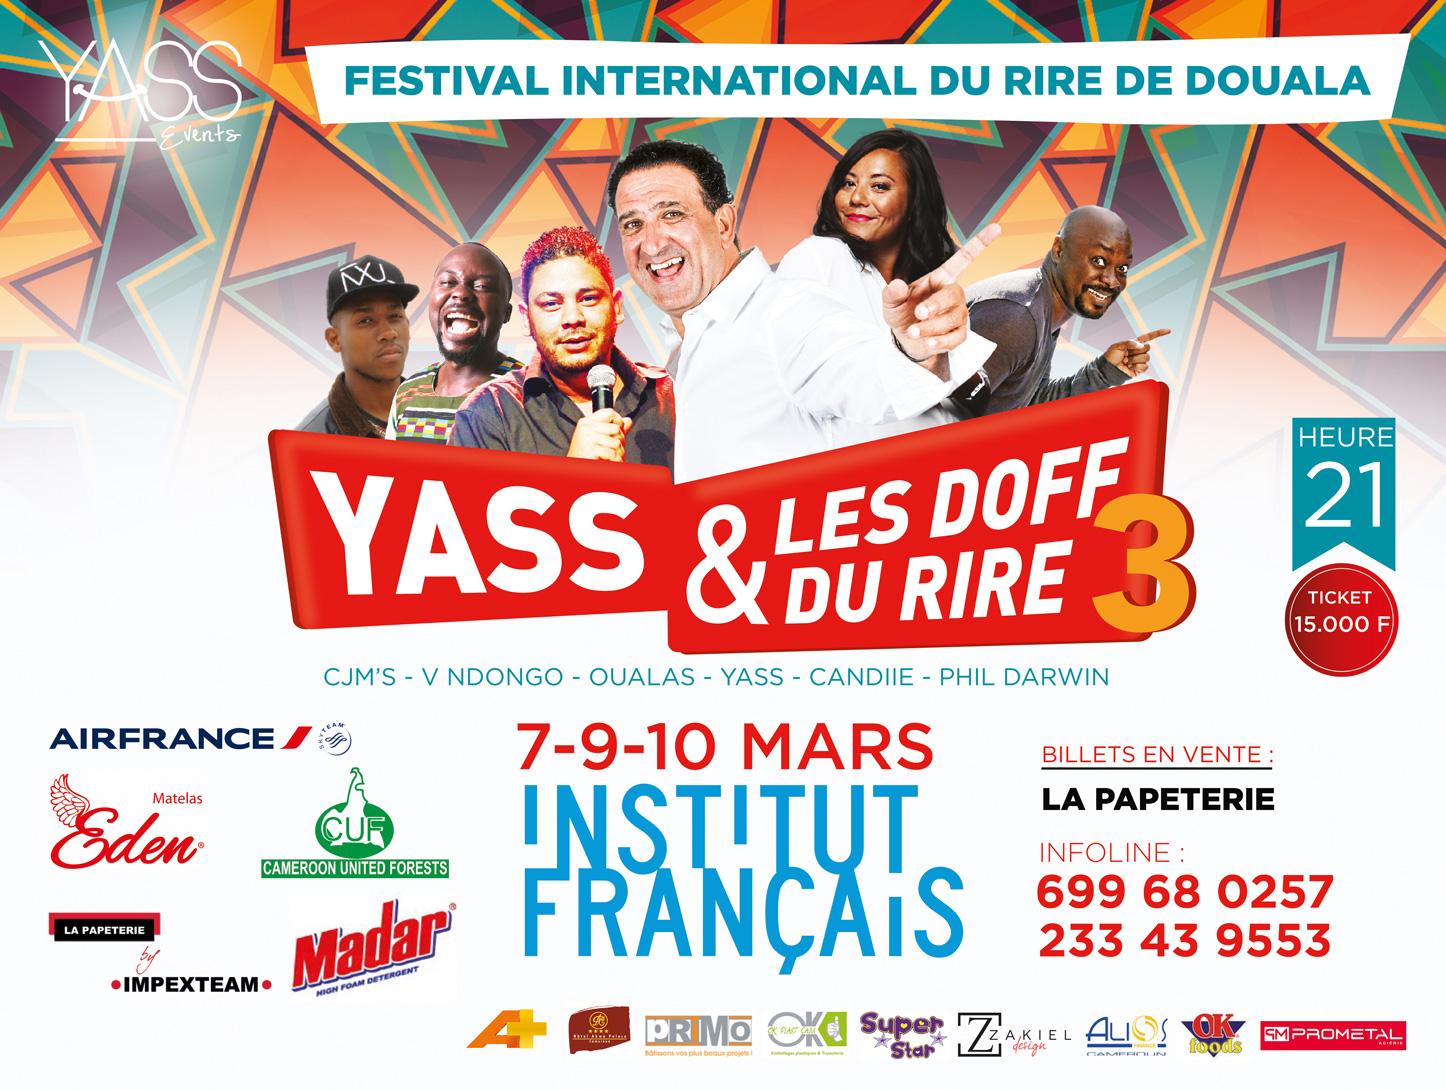 Affiche Festival International Du Rire De Douala.jpg